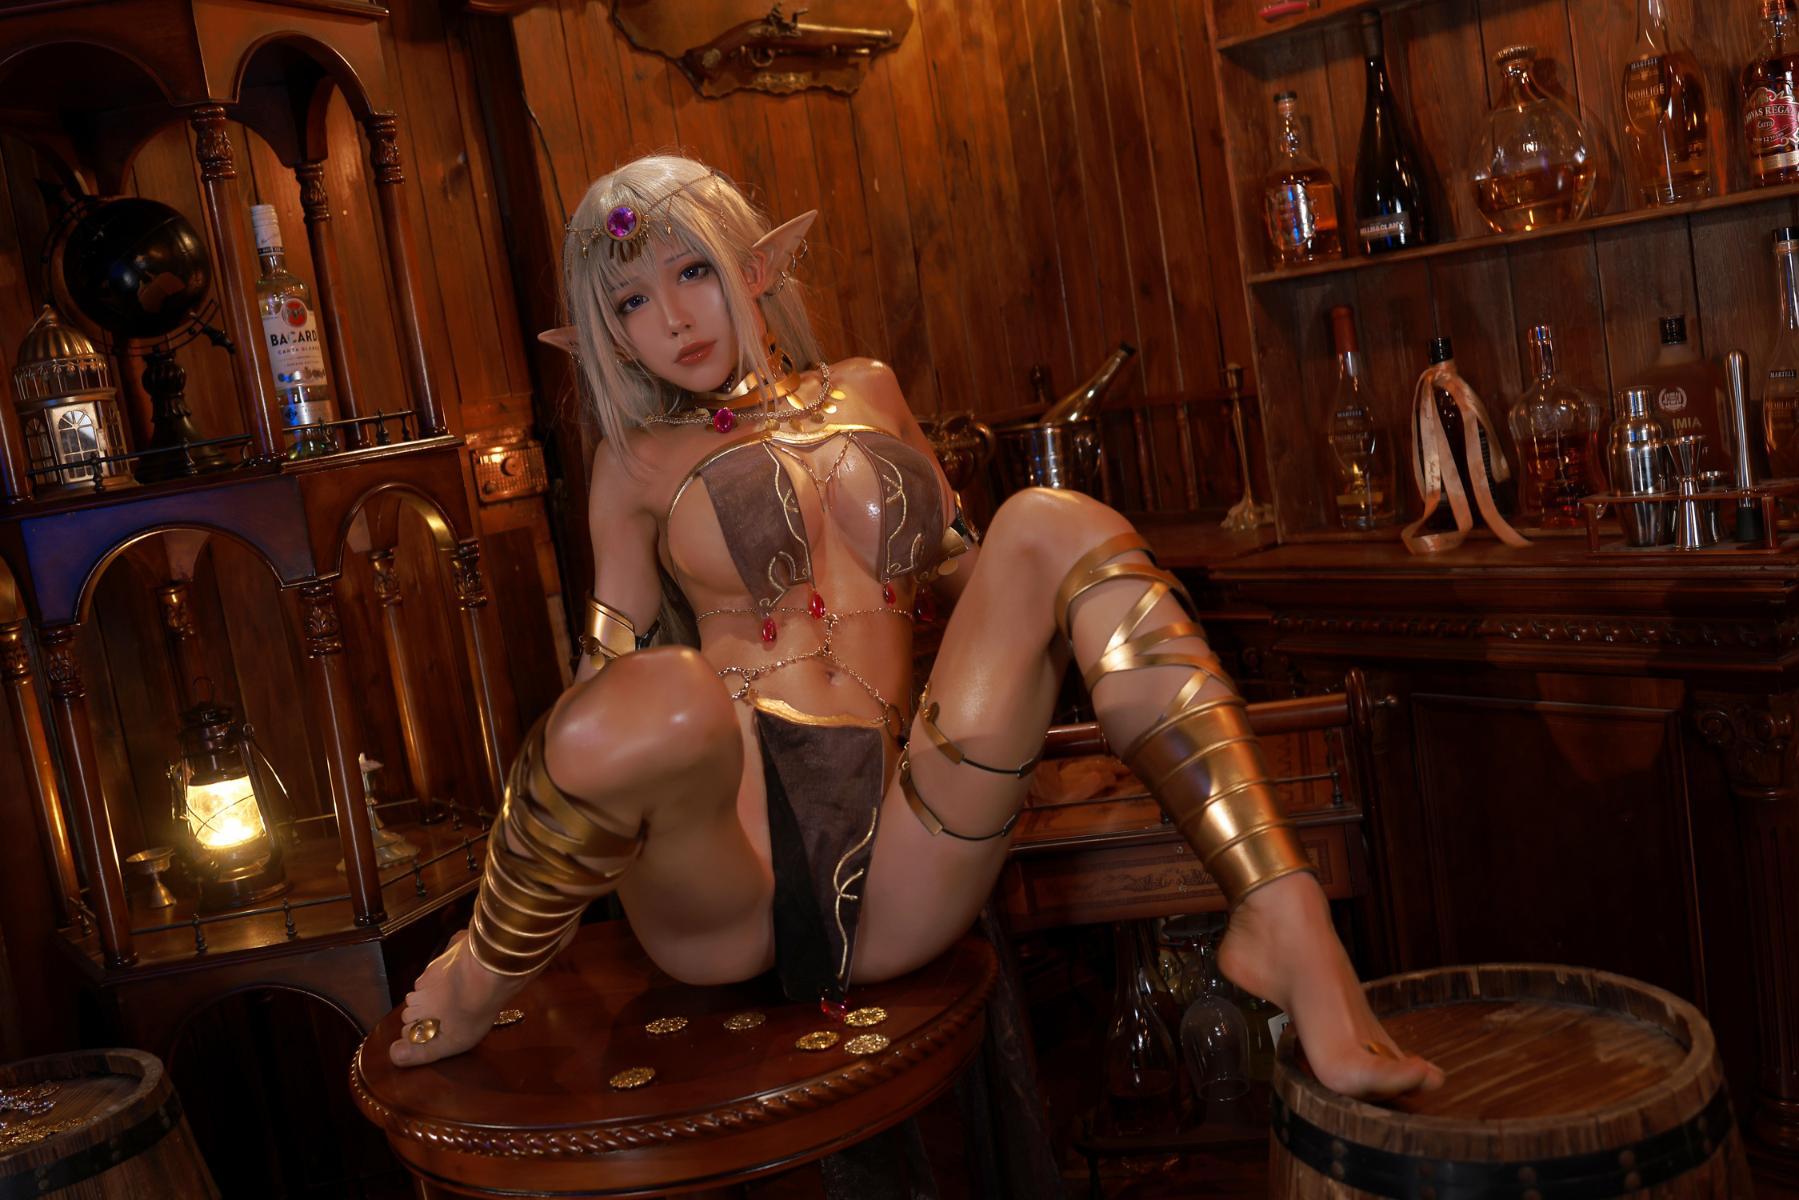 Tan Dancer Elf Succubus Cosplay by Aqua 26